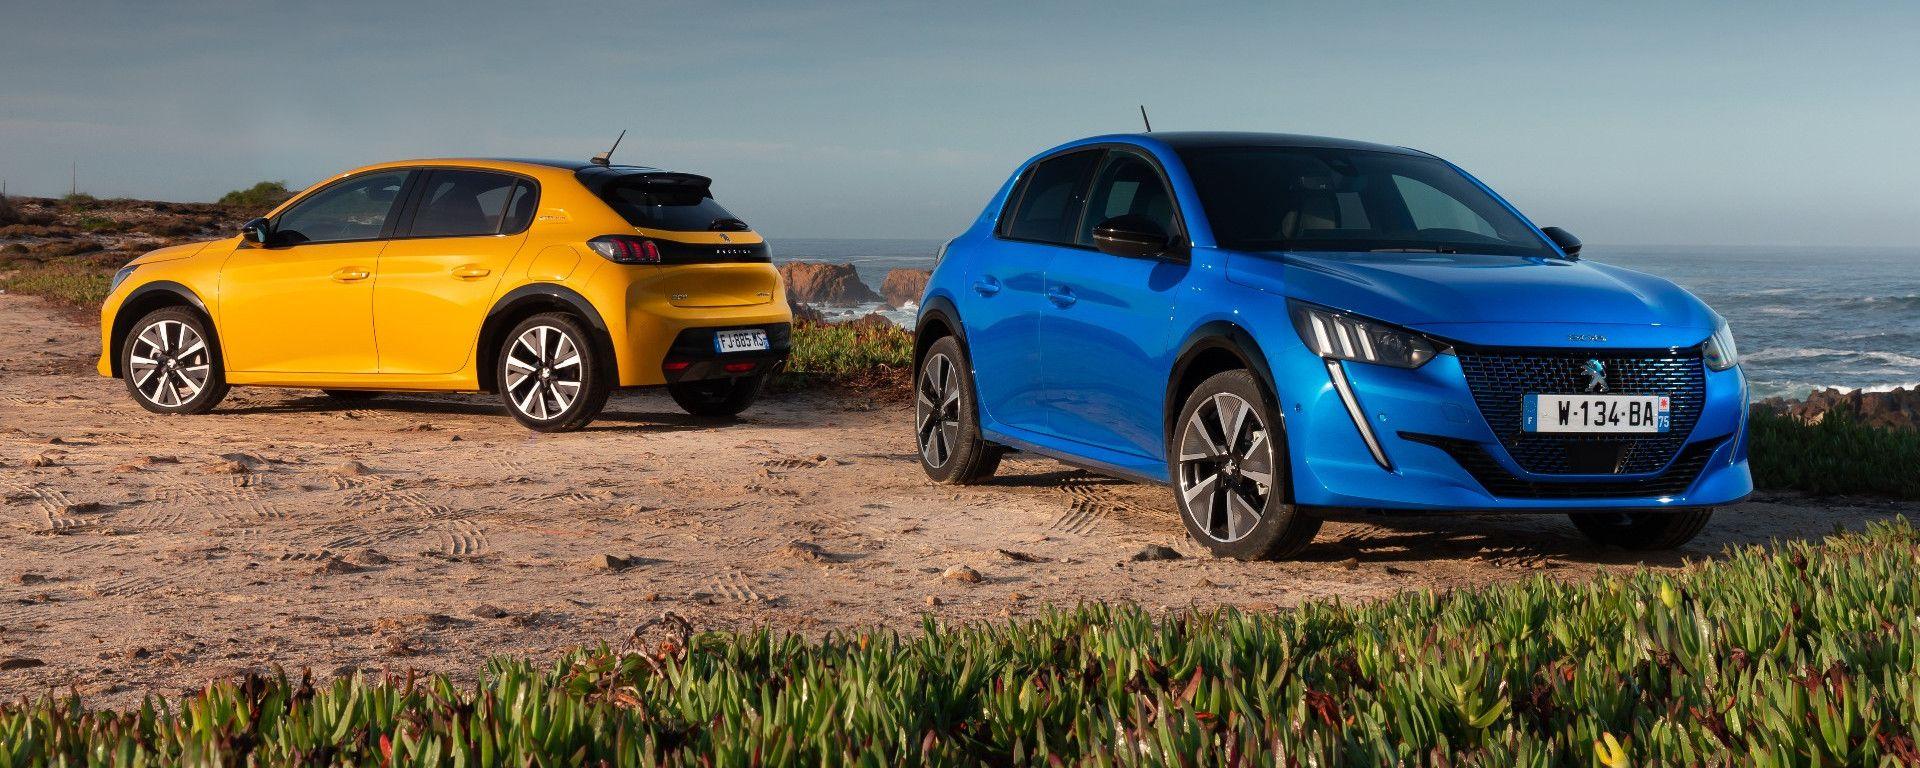 Nuove nomine in Peugeot Italia